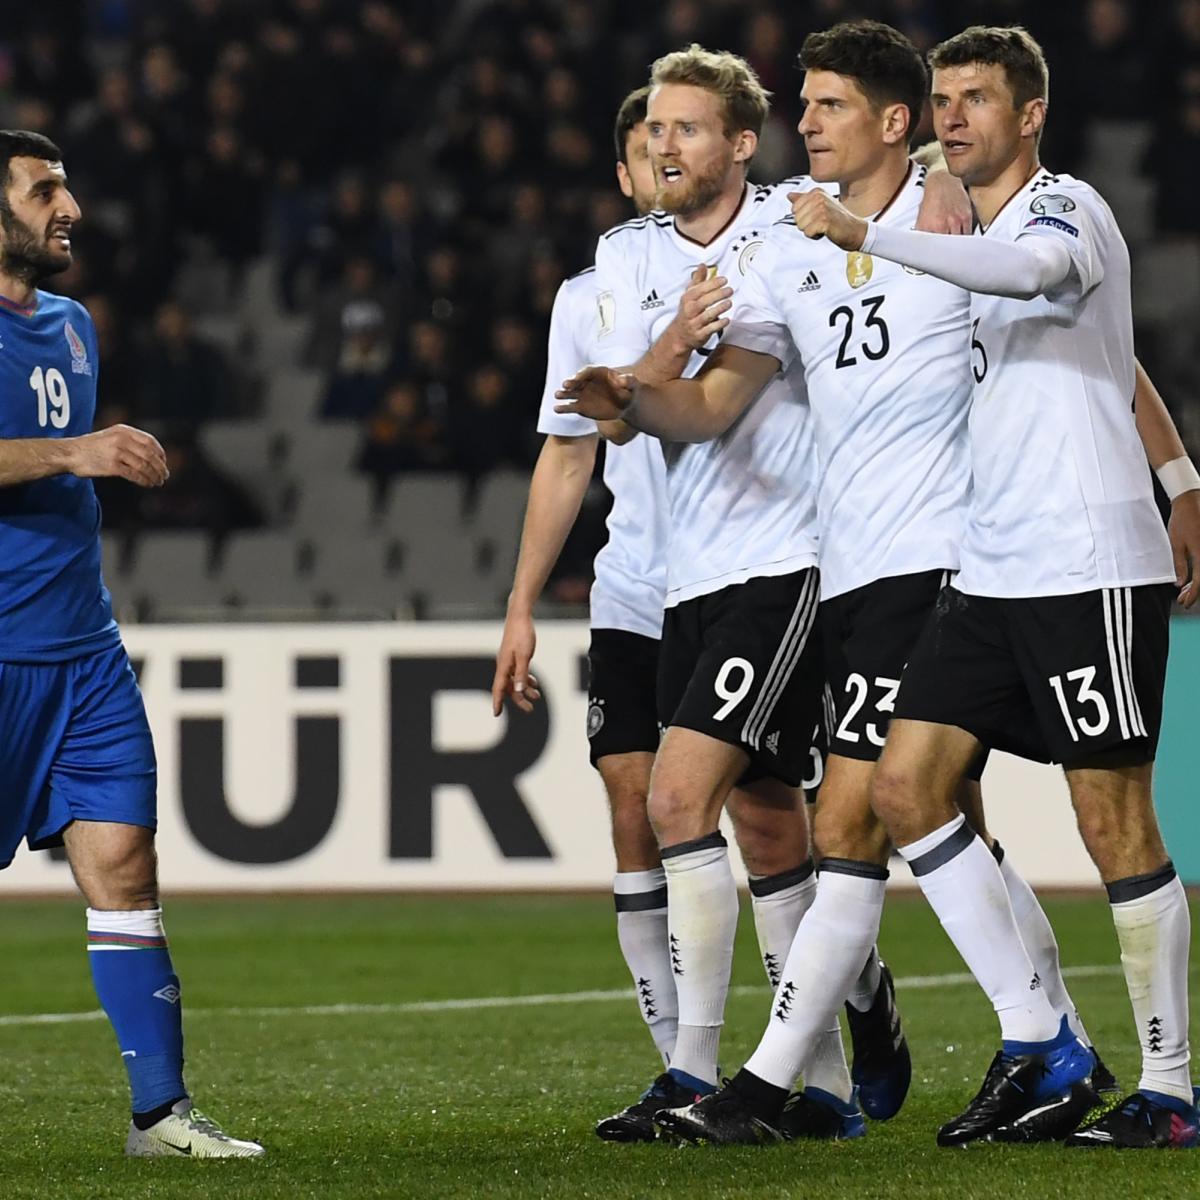 Azerbaijan News And Scores: Azerbaijan Vs. Germany: Score And Reaction For World Cup